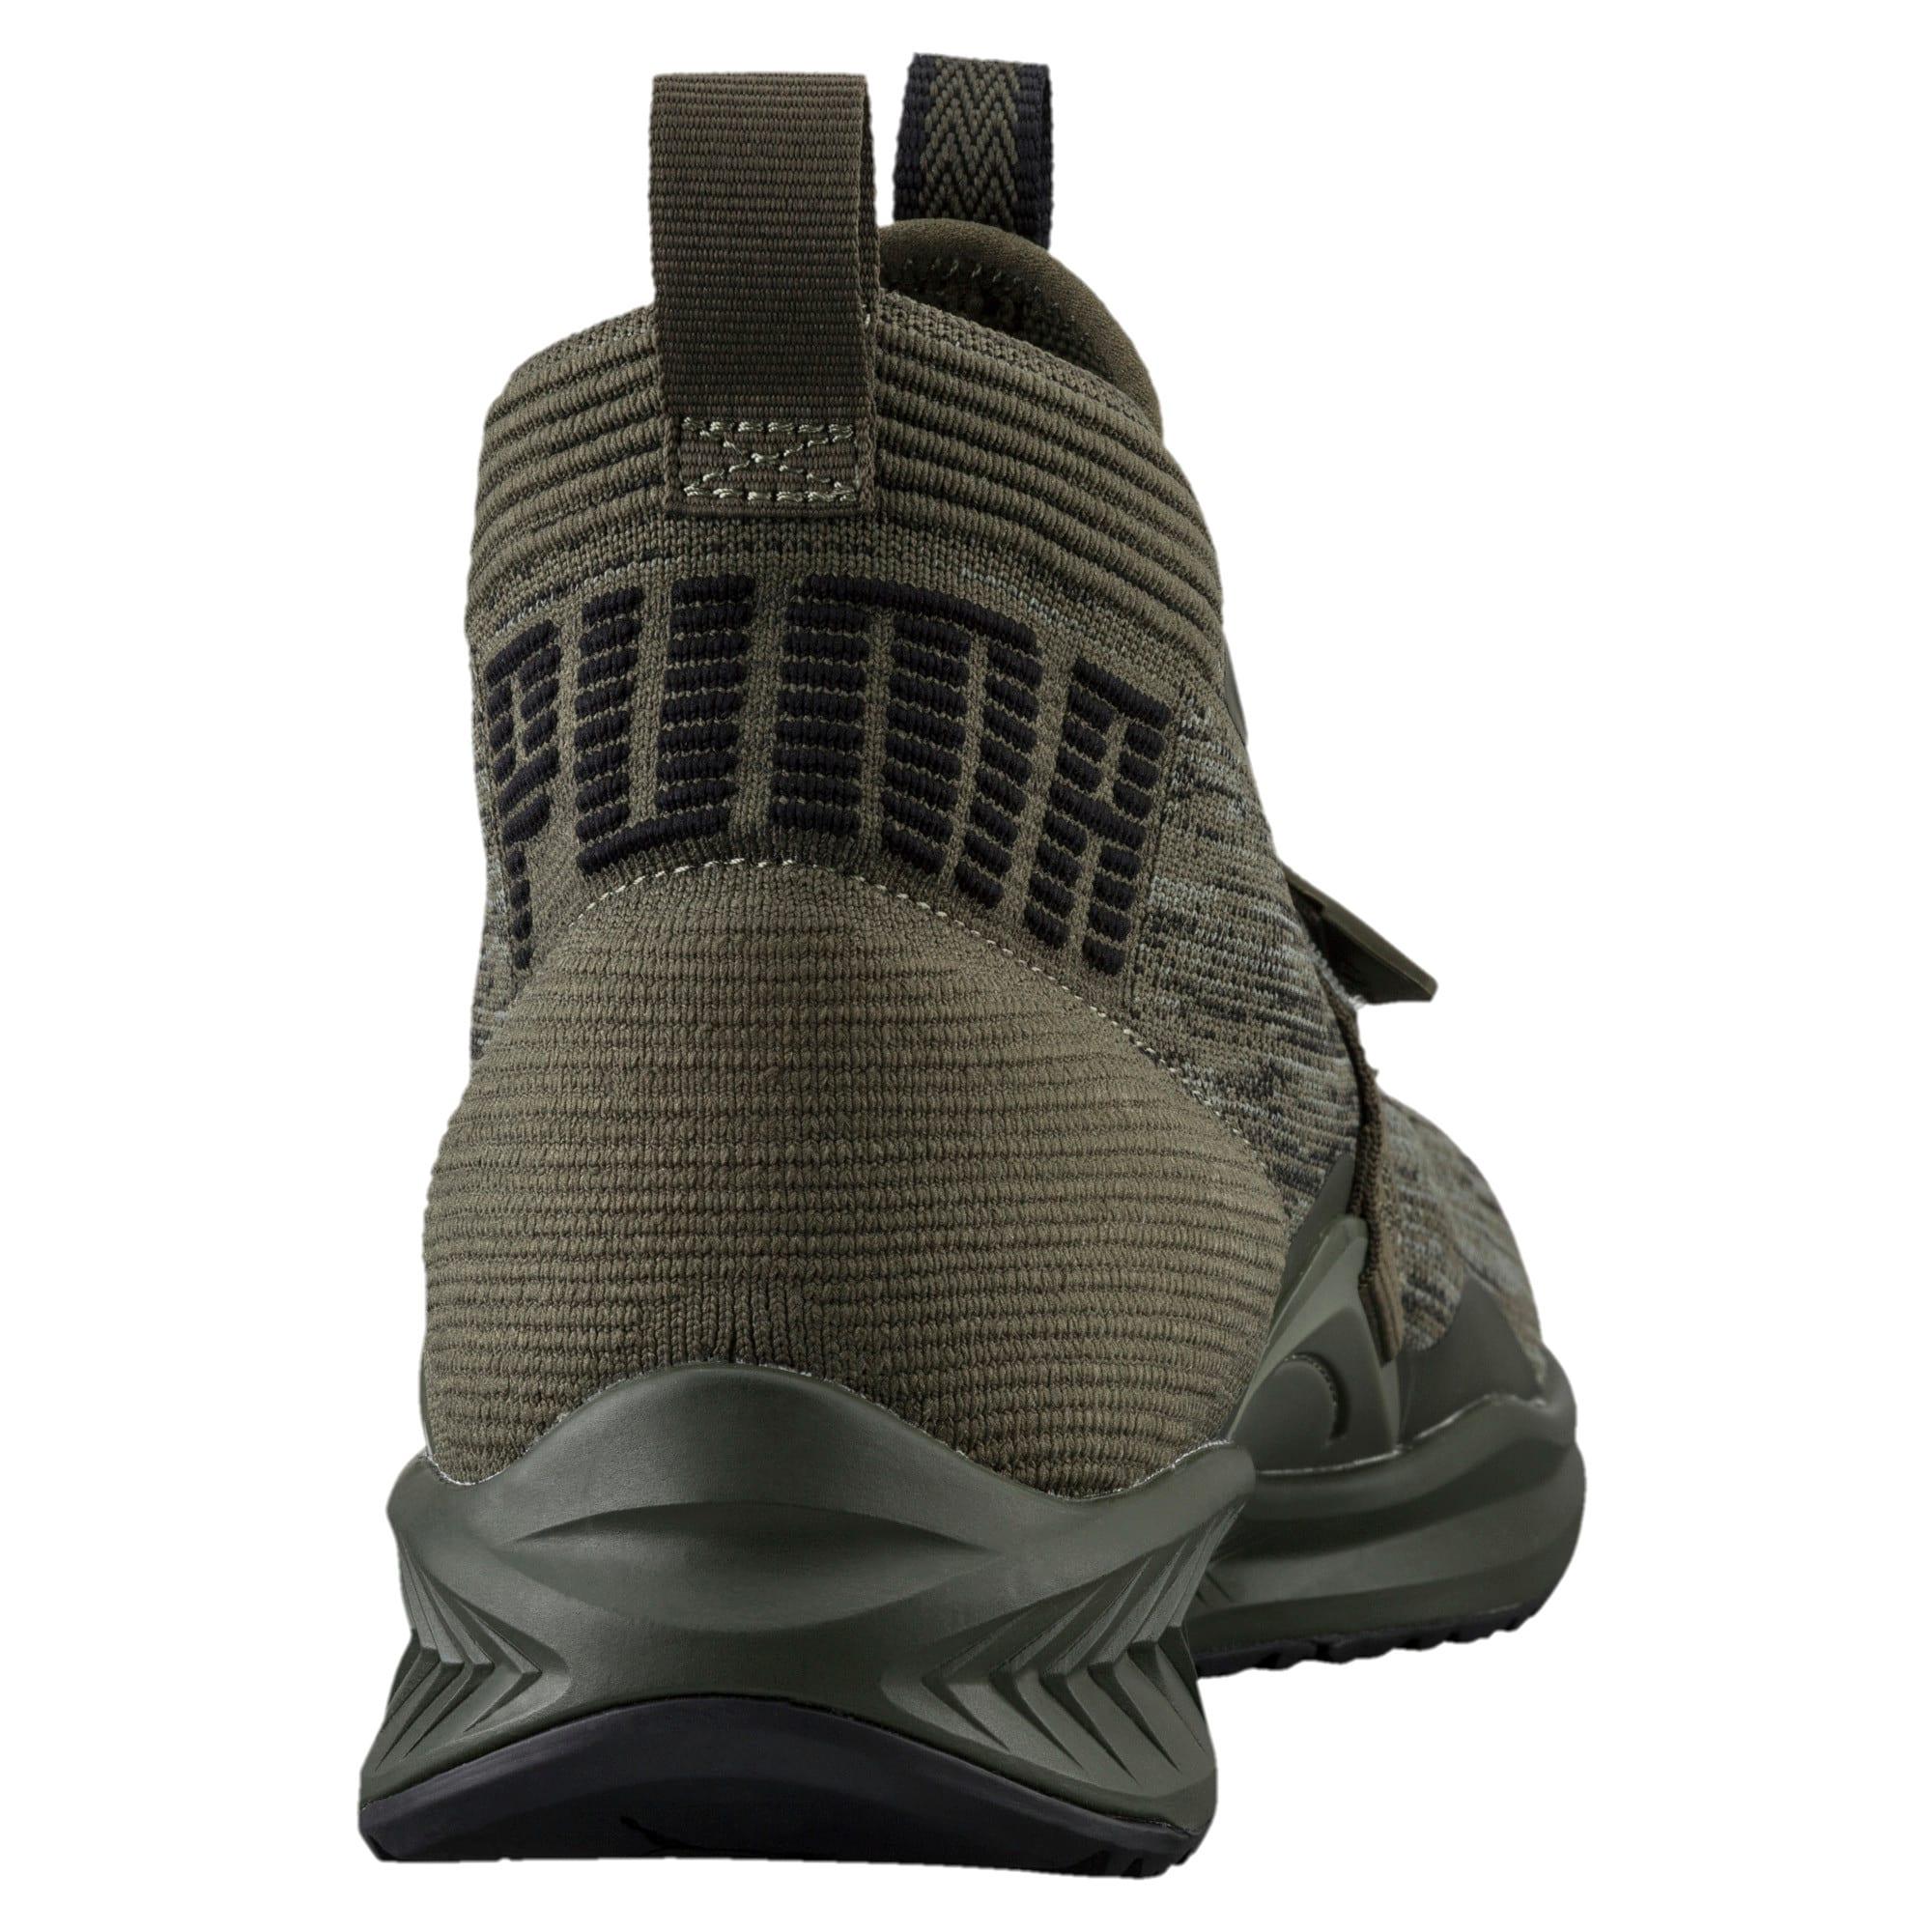 huge selection of 8bc65 465b2 IGNITE evoKNIT 2 Men's Running Shoes